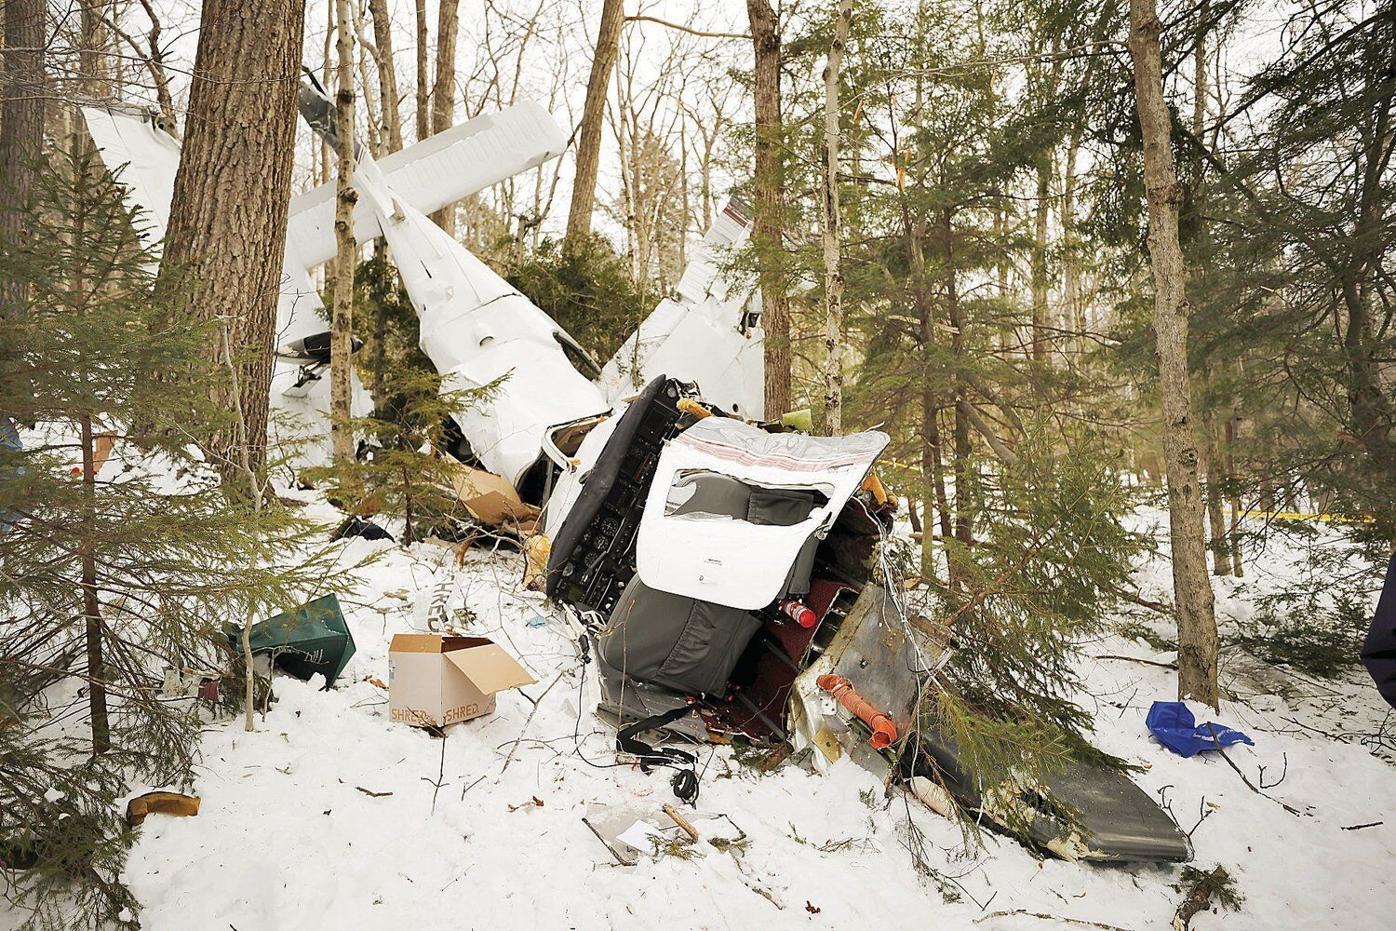 Plane Crash In Town Of Florida Made For A Harrowing Evening Archives Benningtonbanner Com